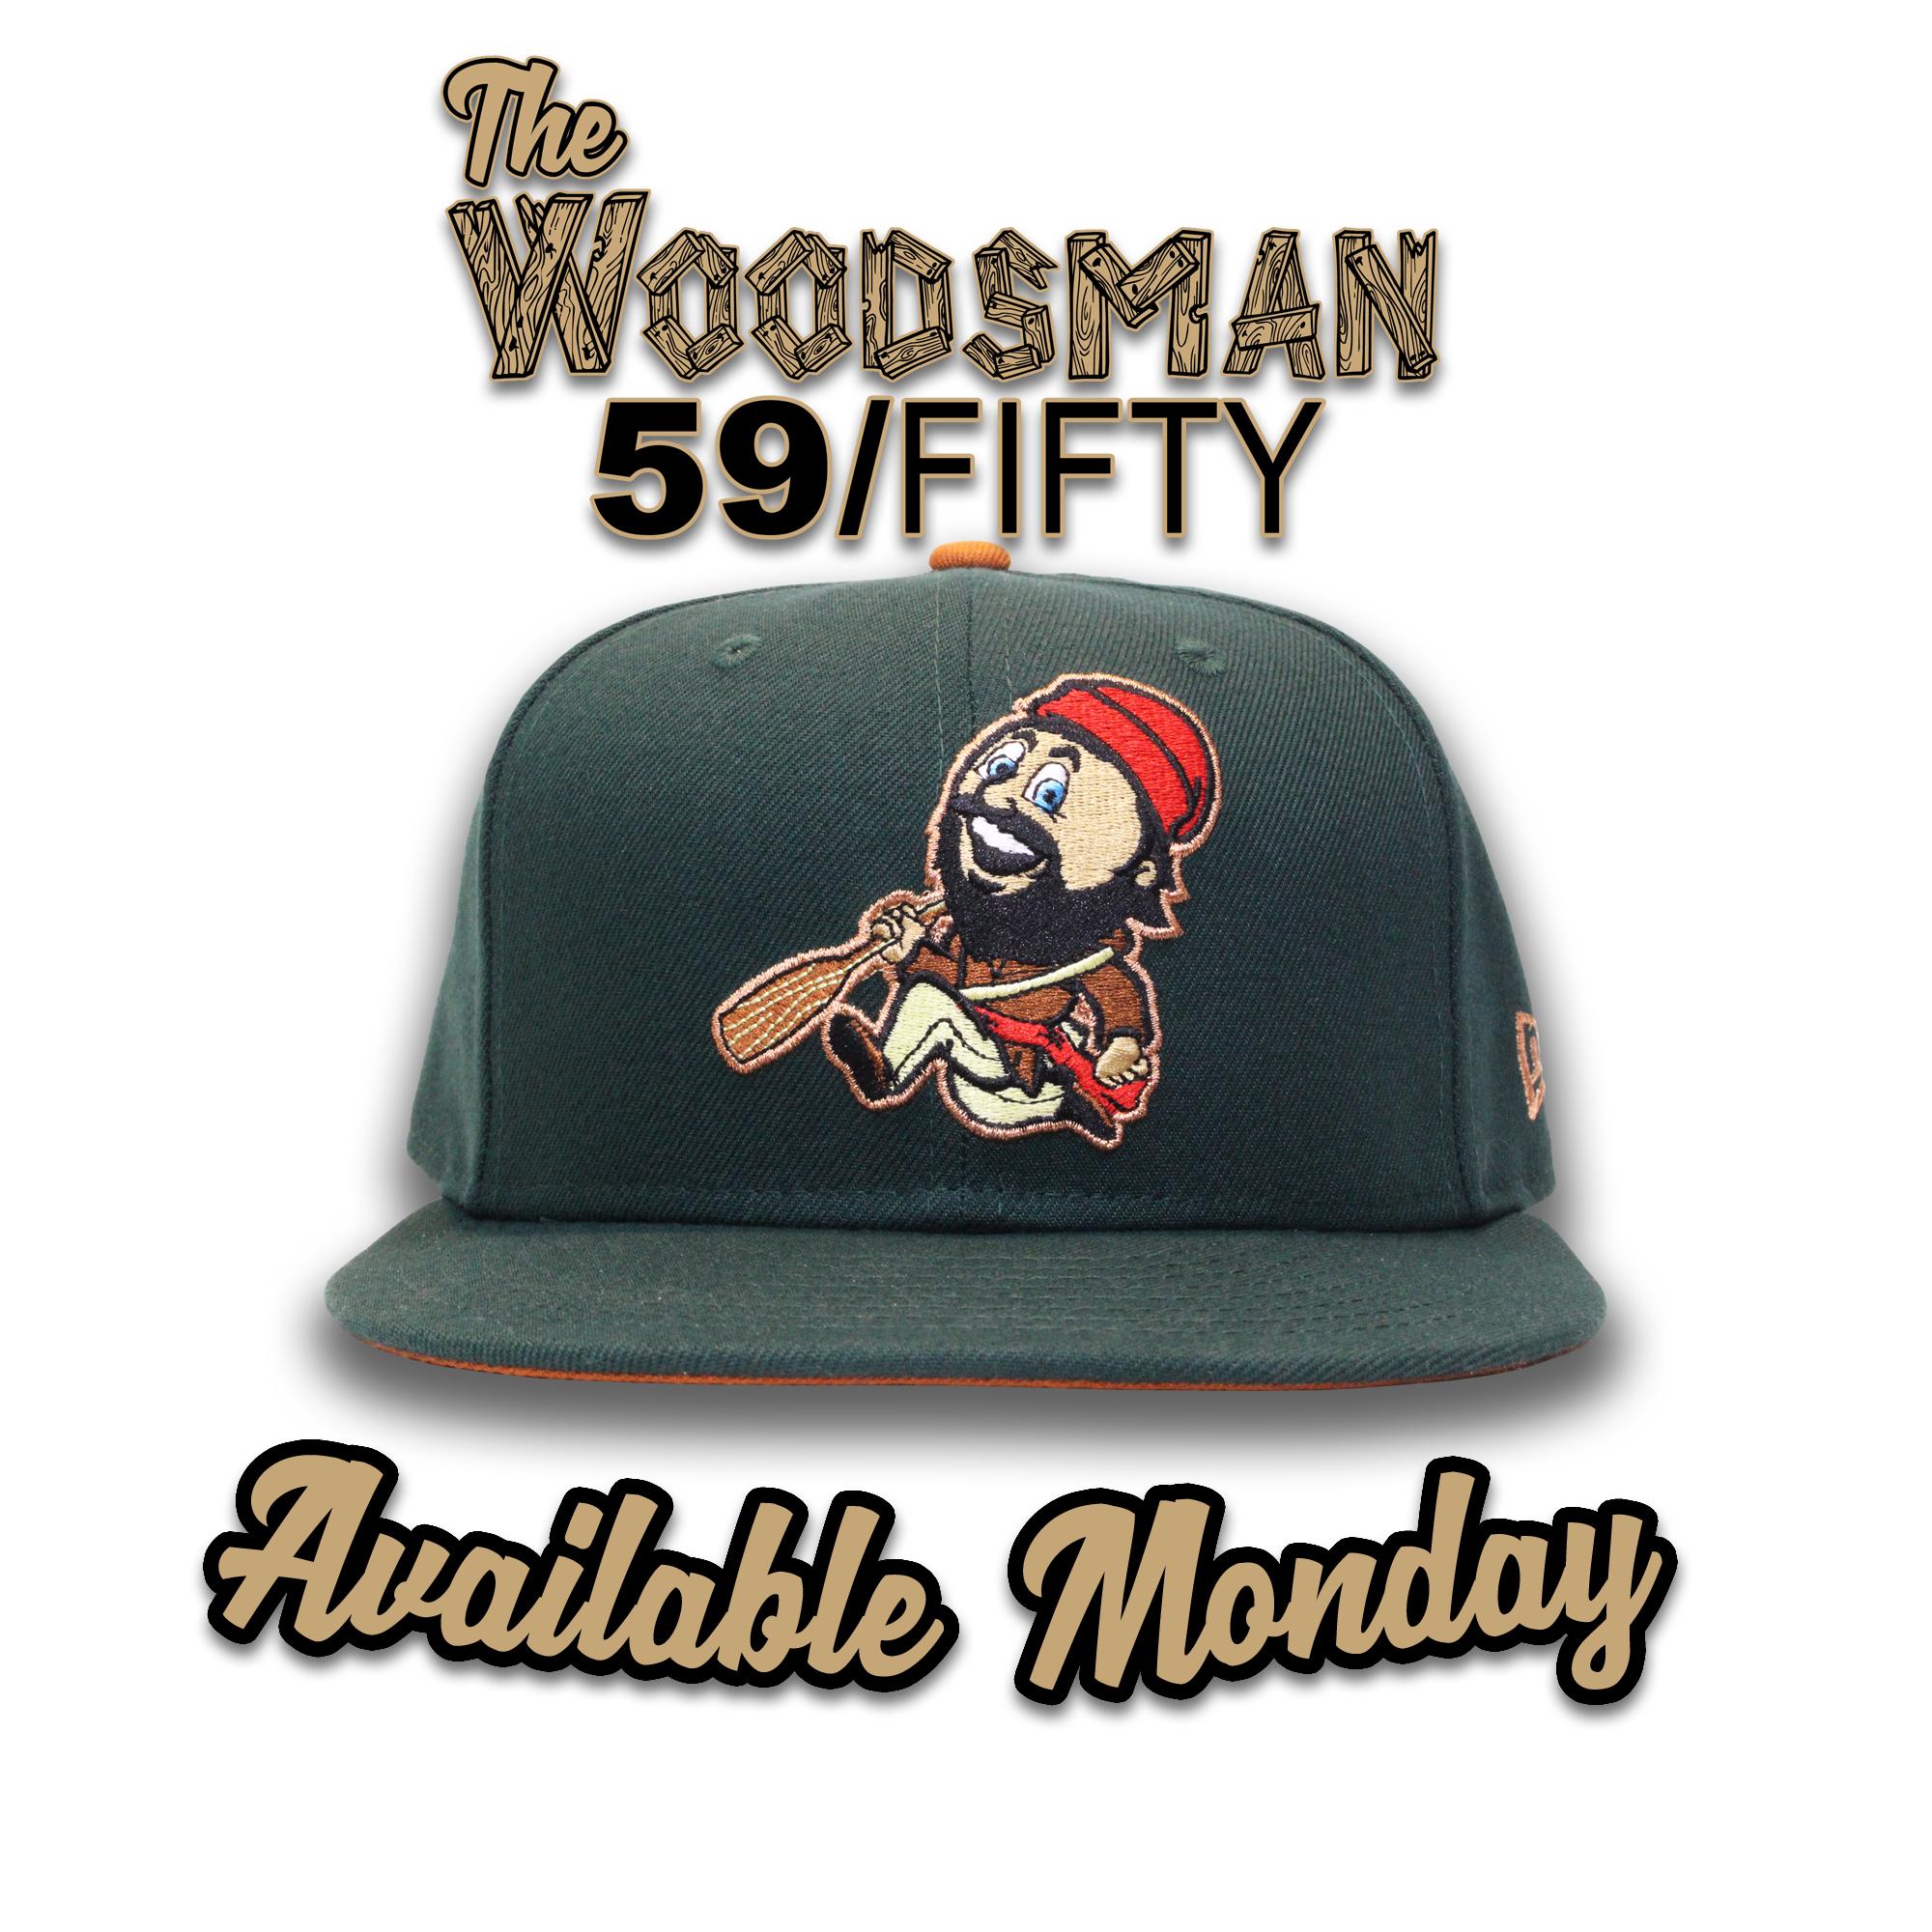 Woodsman Available Monday.jpg